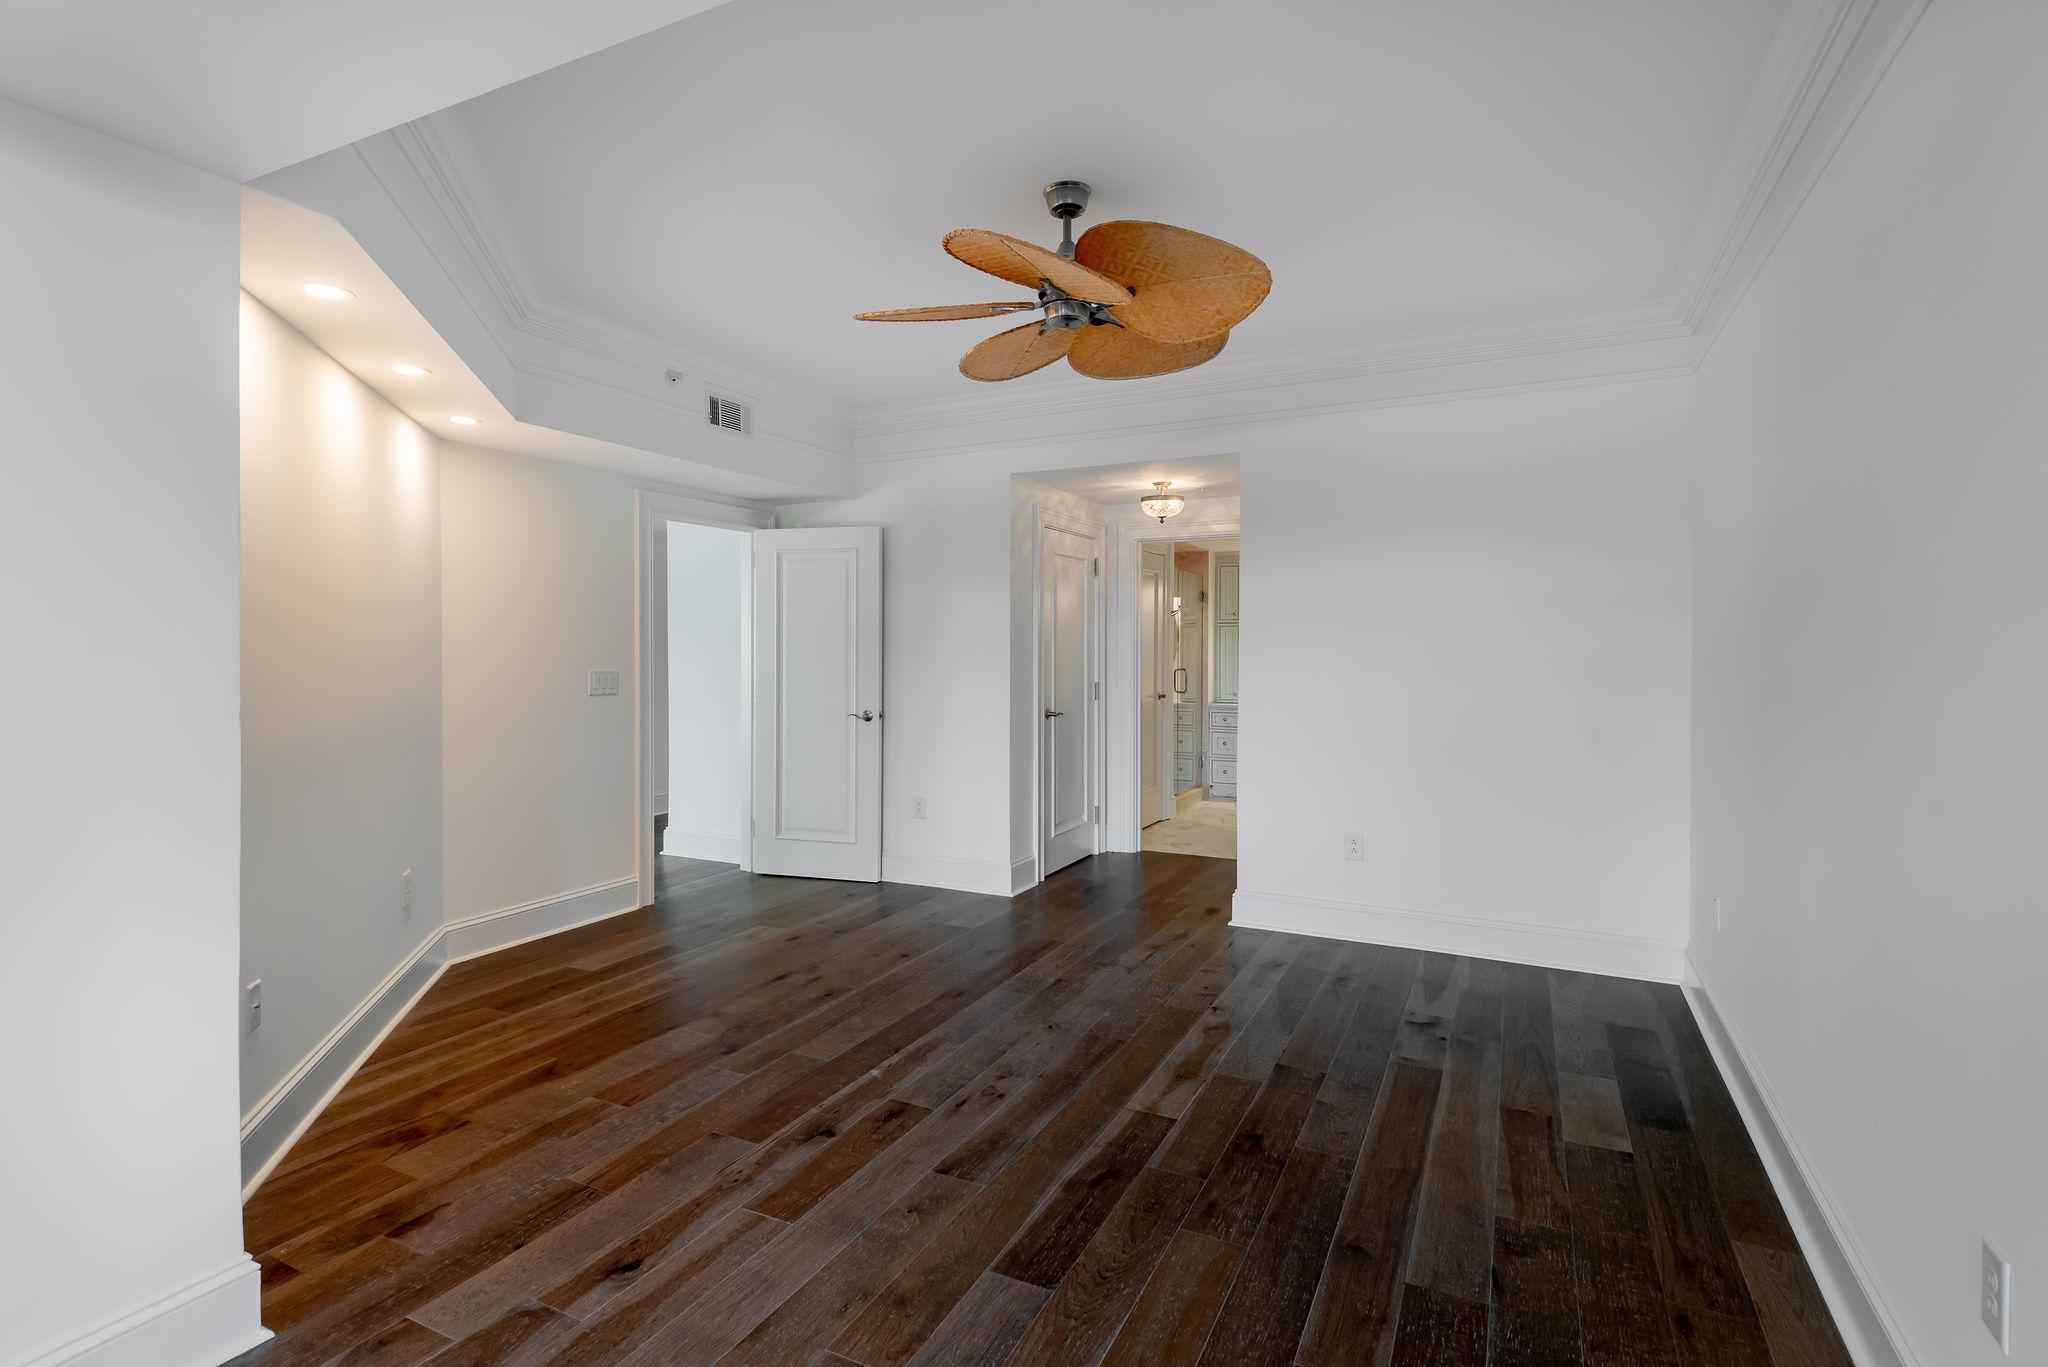 Renaissance On Chas Harbor Homes For Sale - 211 Plaza, Mount Pleasant, SC - 37